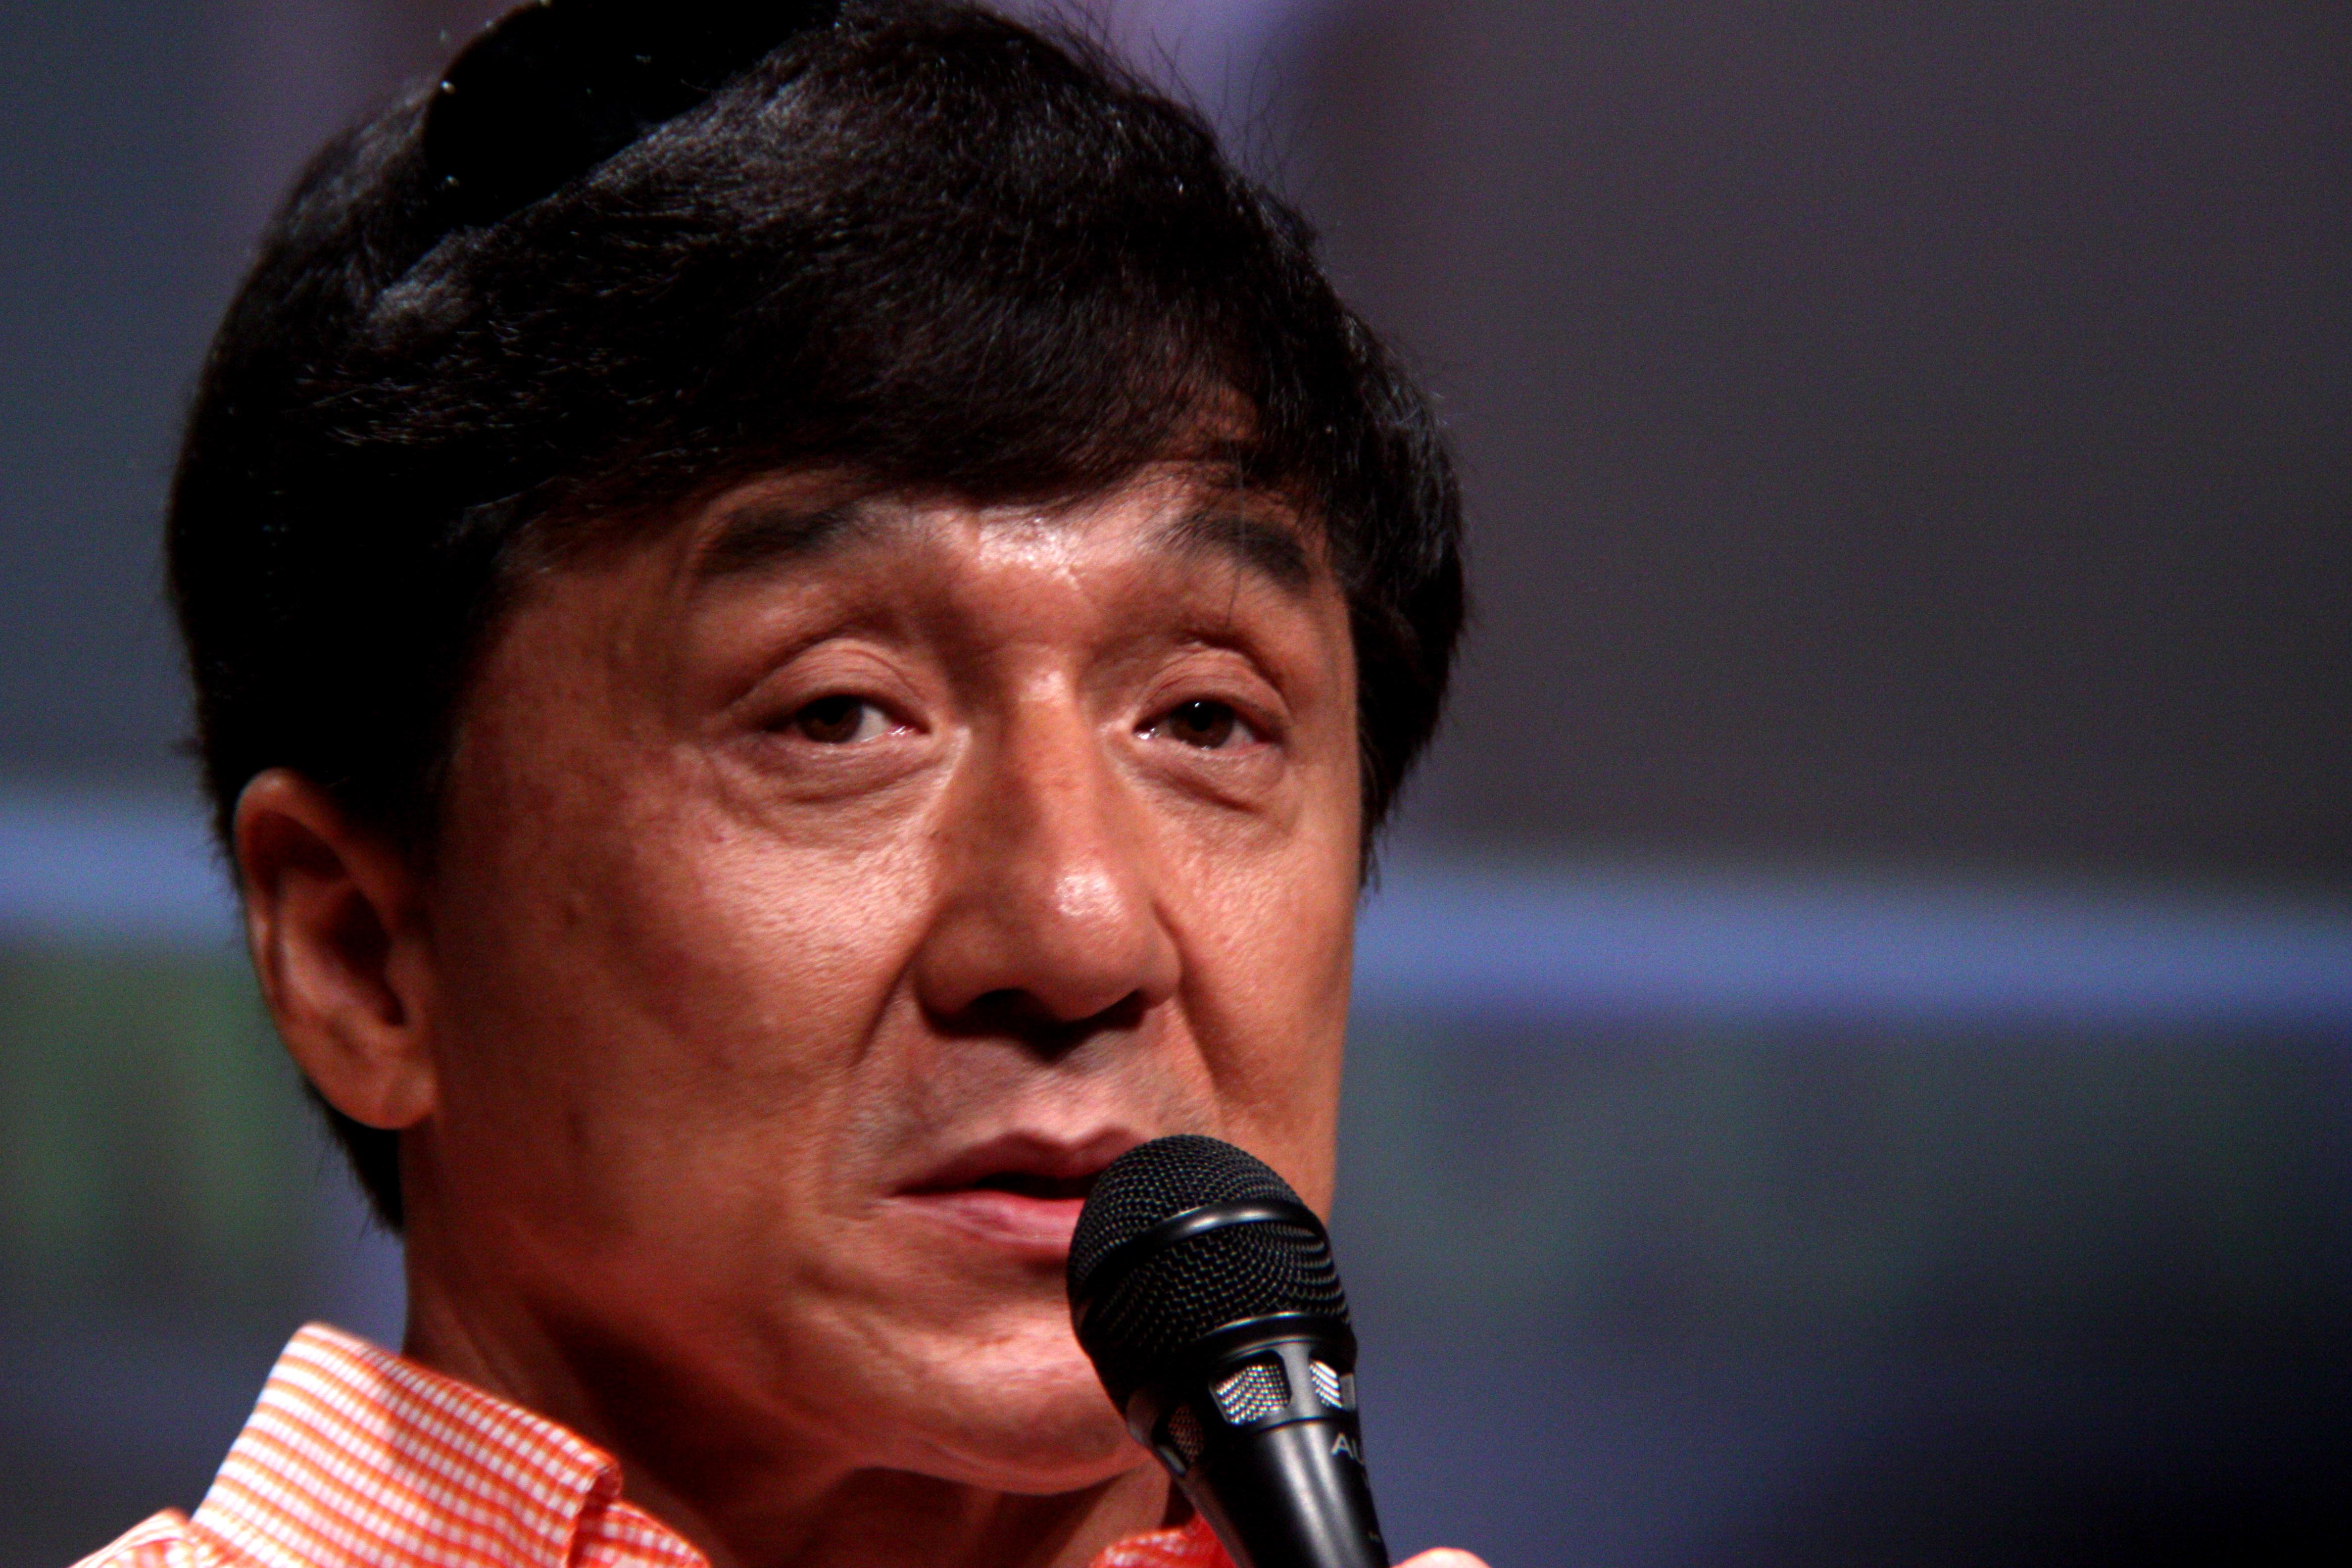 Jackie Chan photo #105234, Jackie Chan image